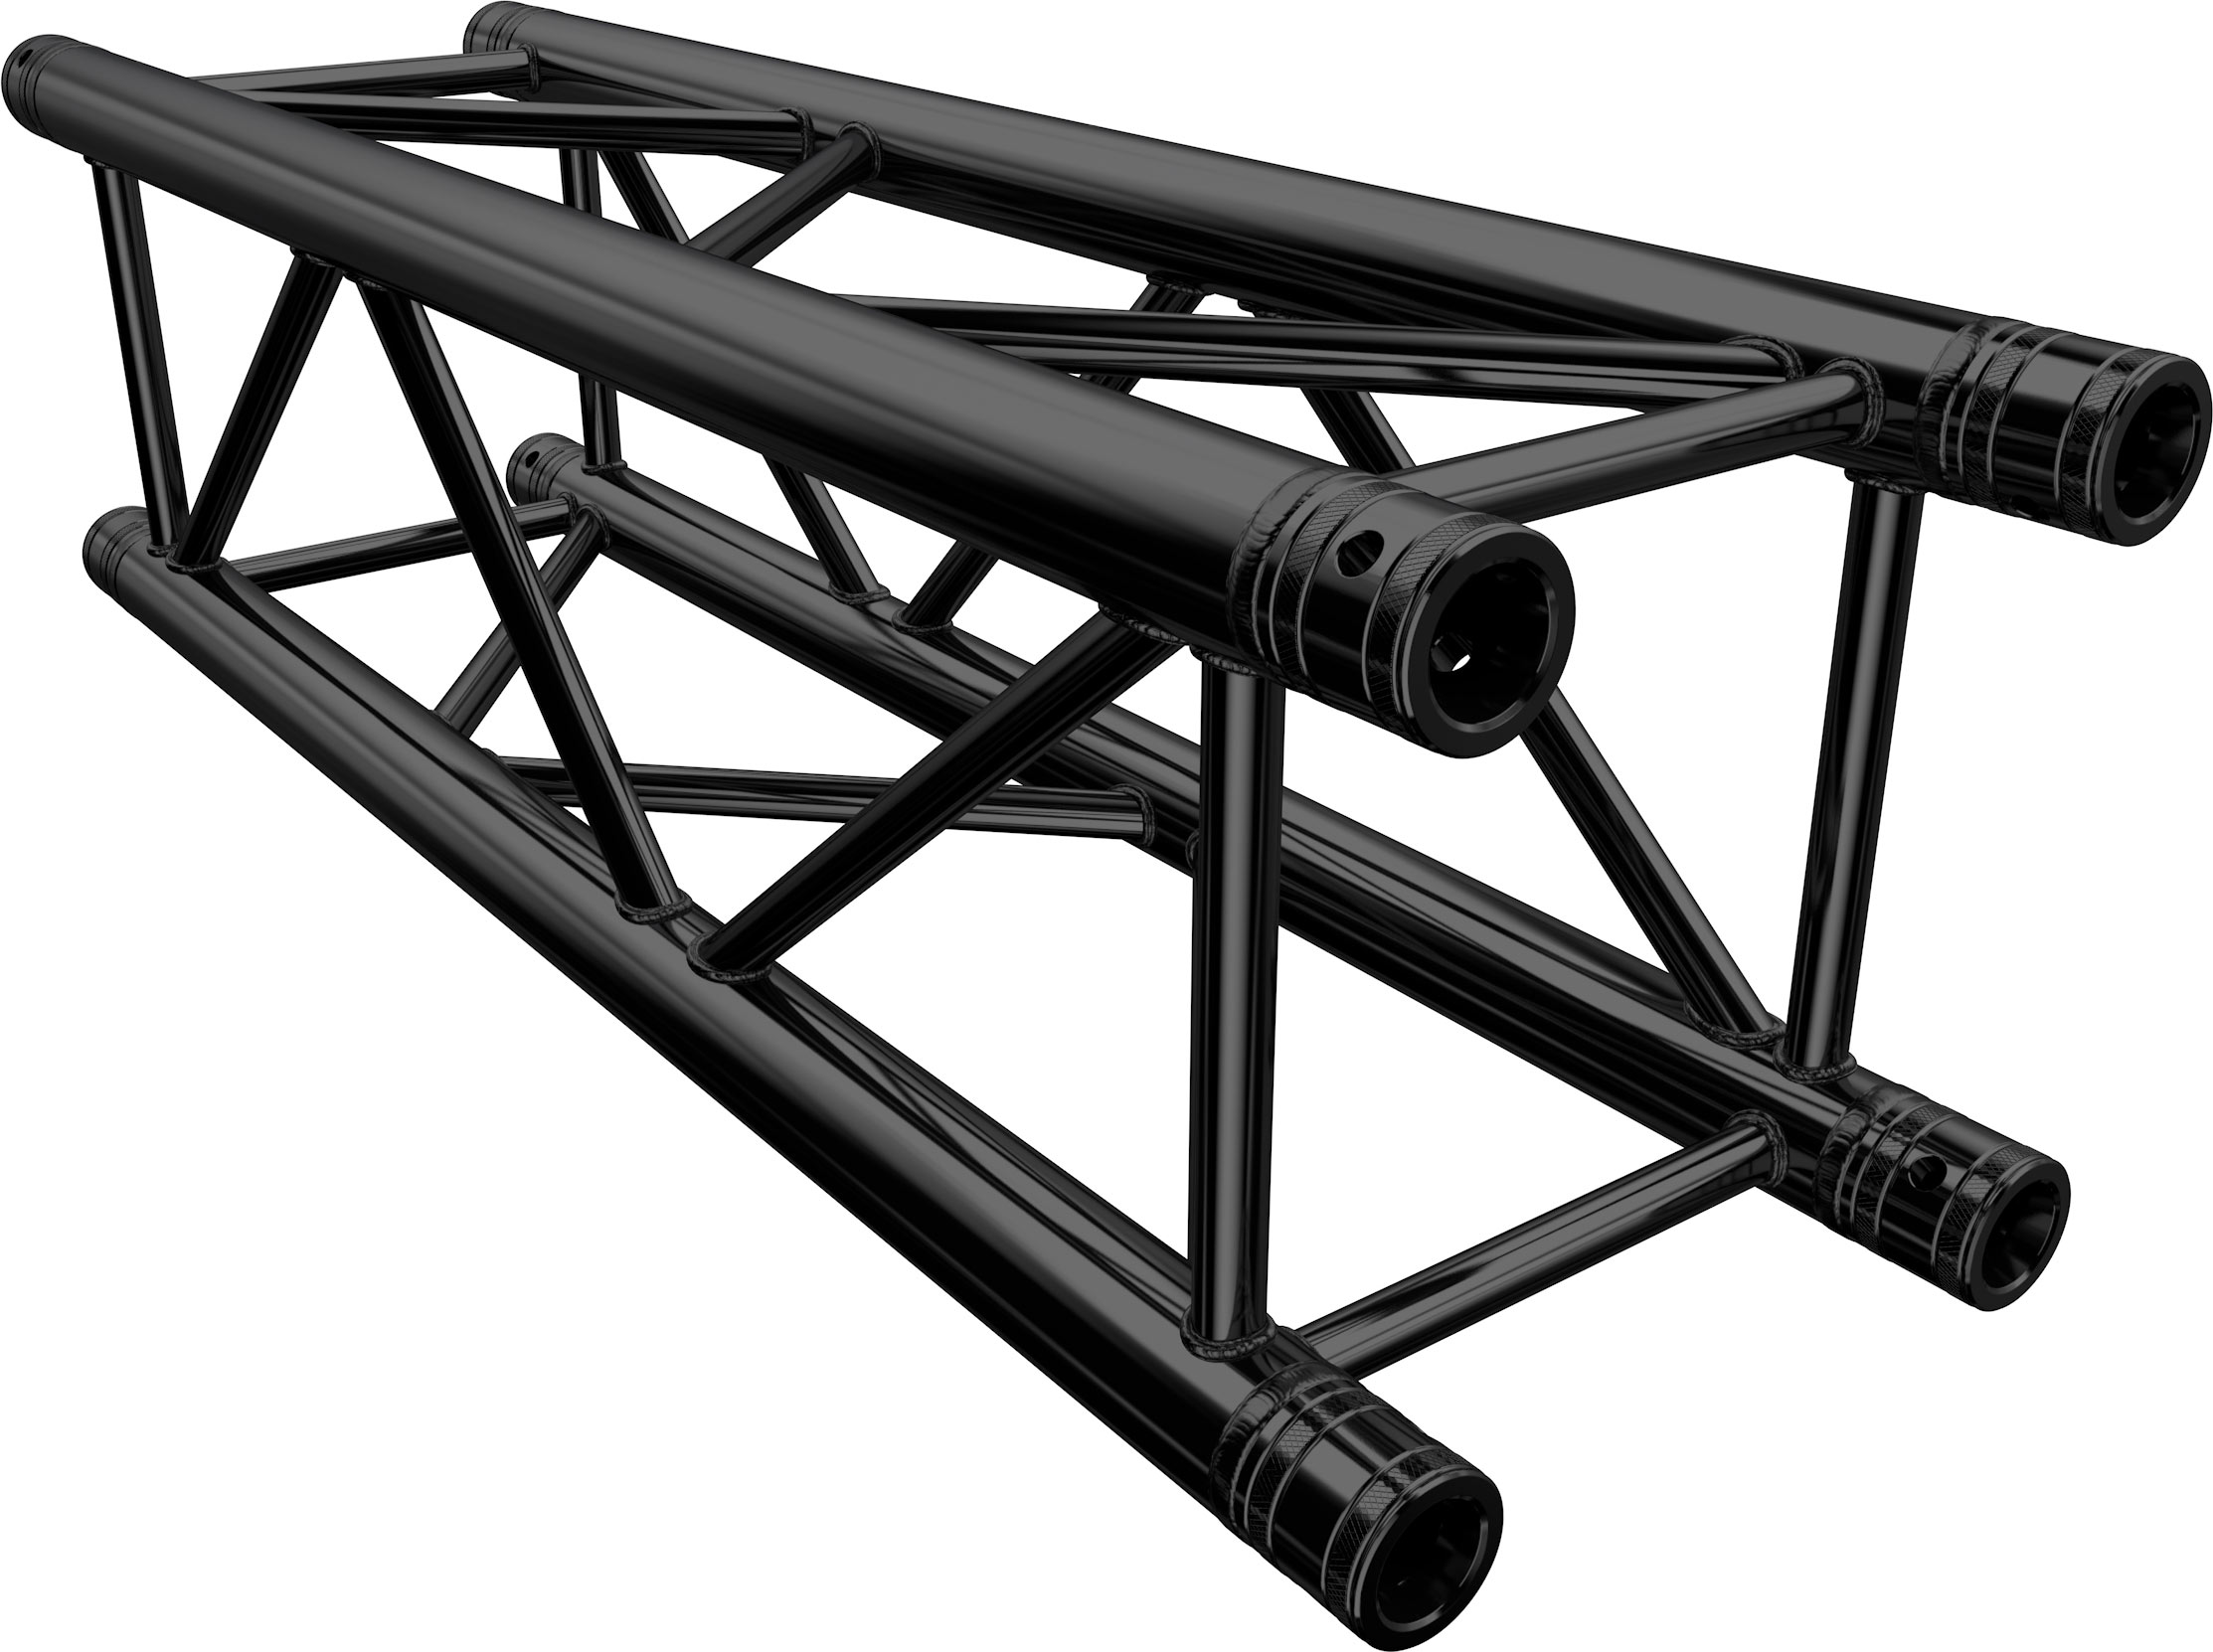 Global Truss Traverse F34 100 cm Stage Black